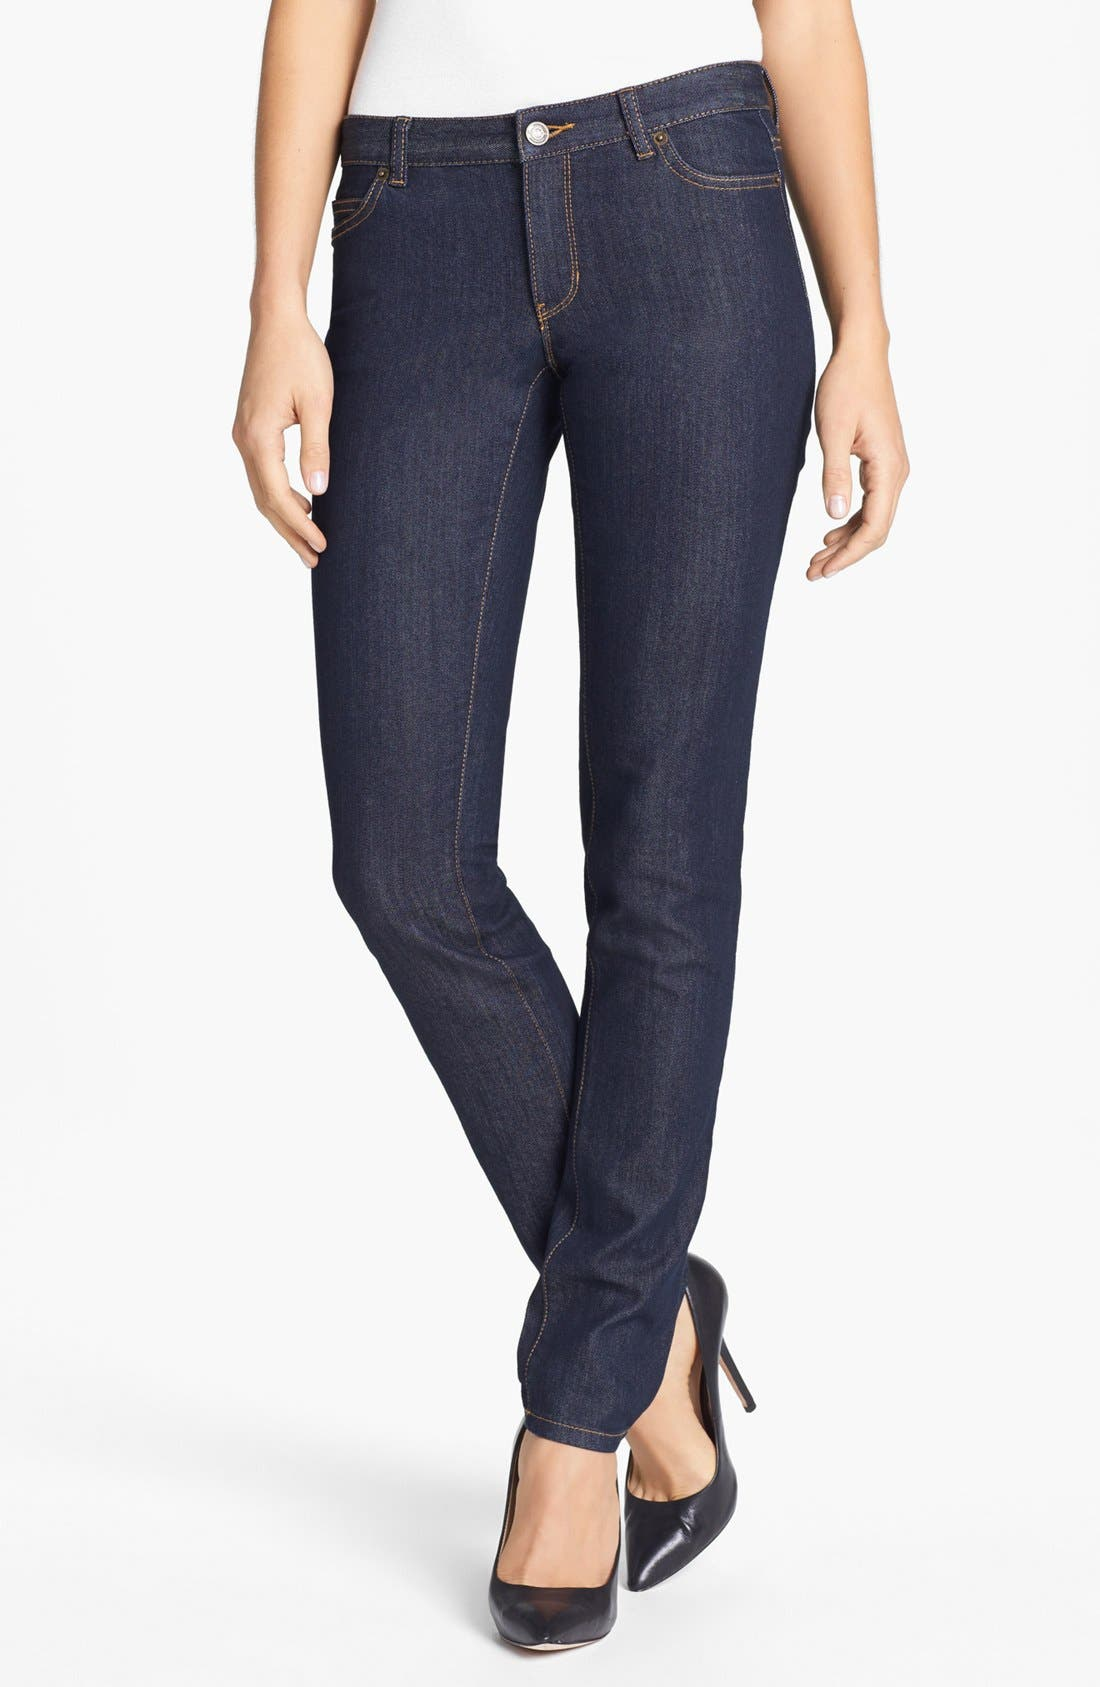 Alternate Image 1 Selected - MICHAEL Michael Kors 'Sausalito' Skinny Jeans (Premiere Indigo)